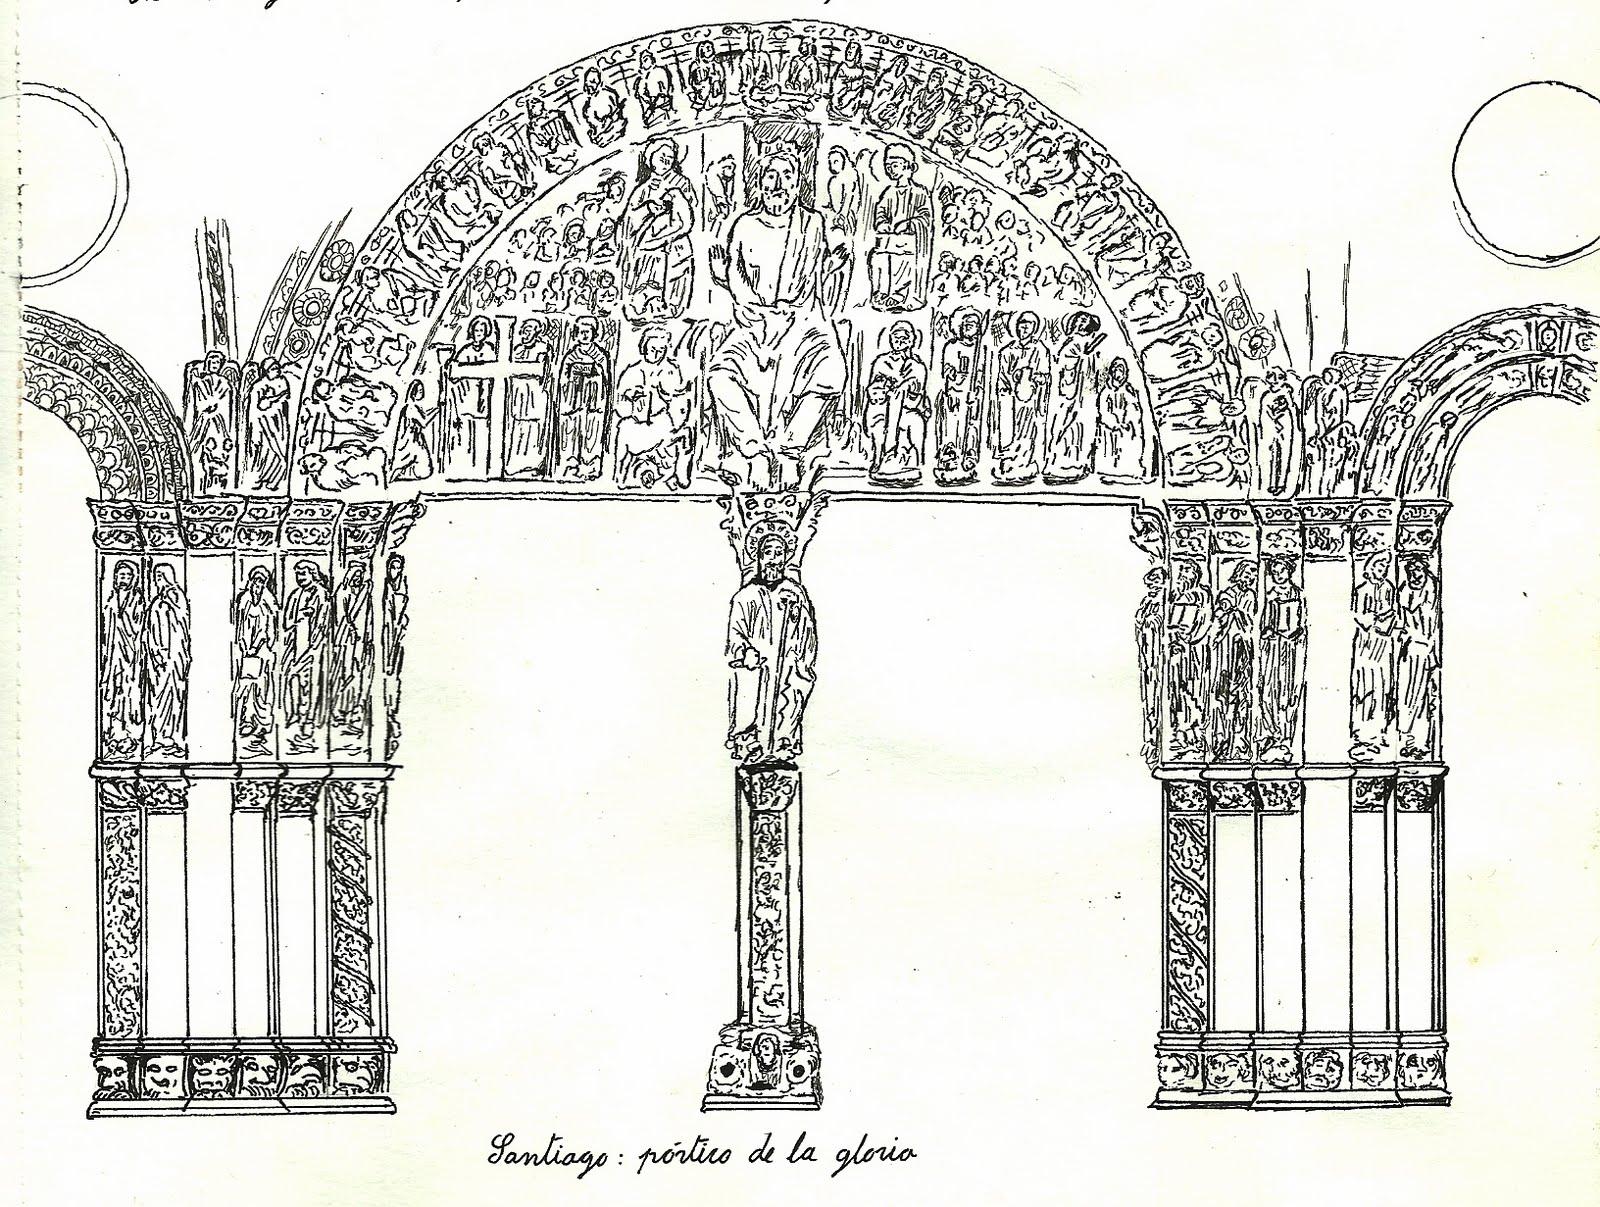 Perez Davila: Portico de la gloria (Catedral de Santiago